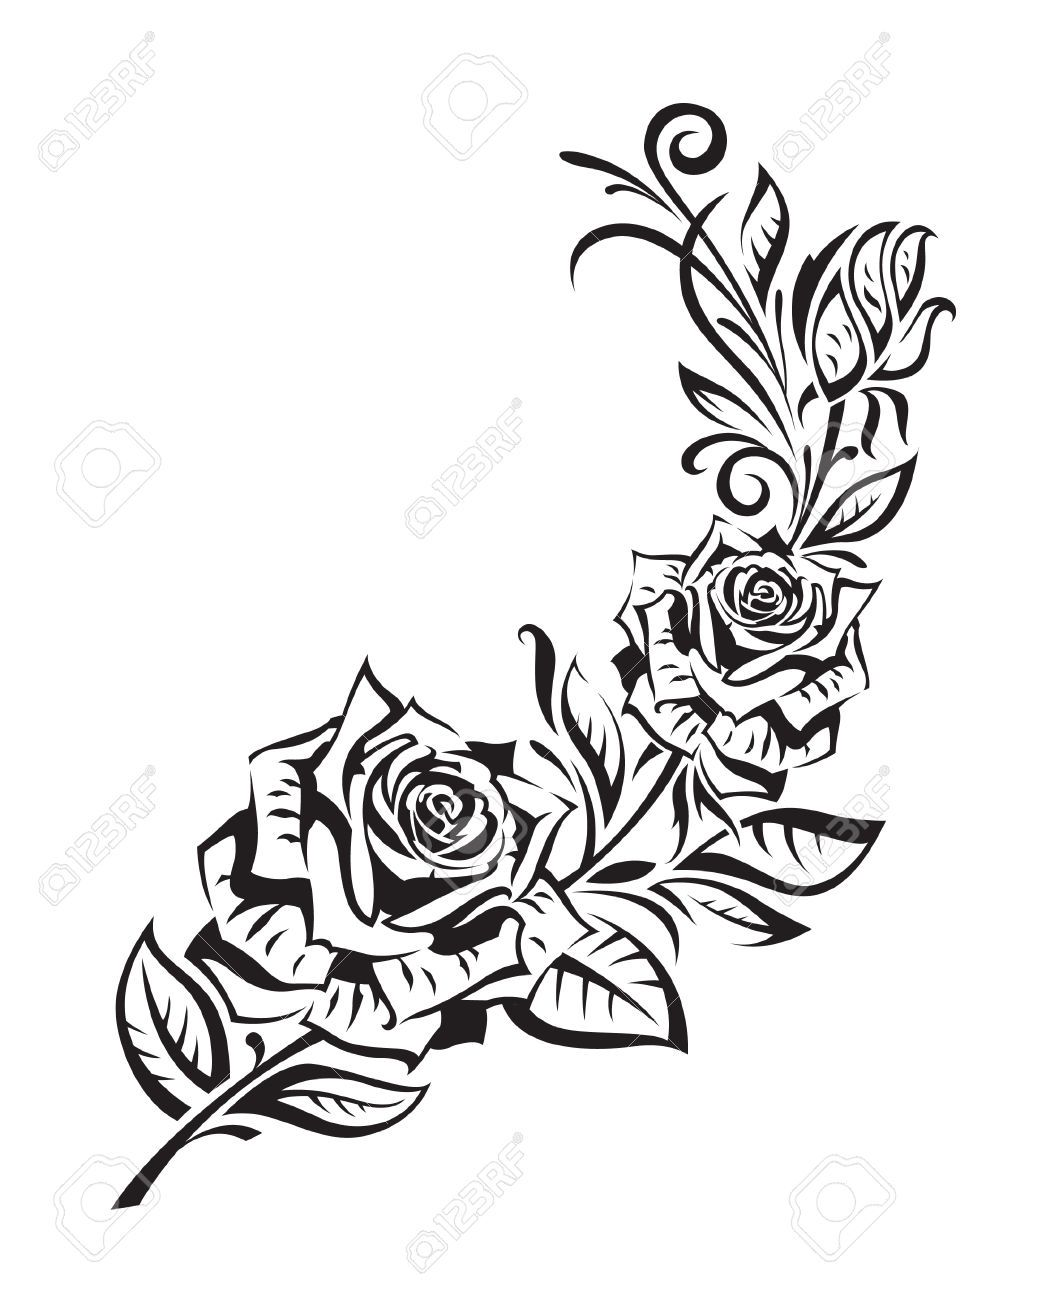 1063x1300 Black And White Rose Bush Drawing